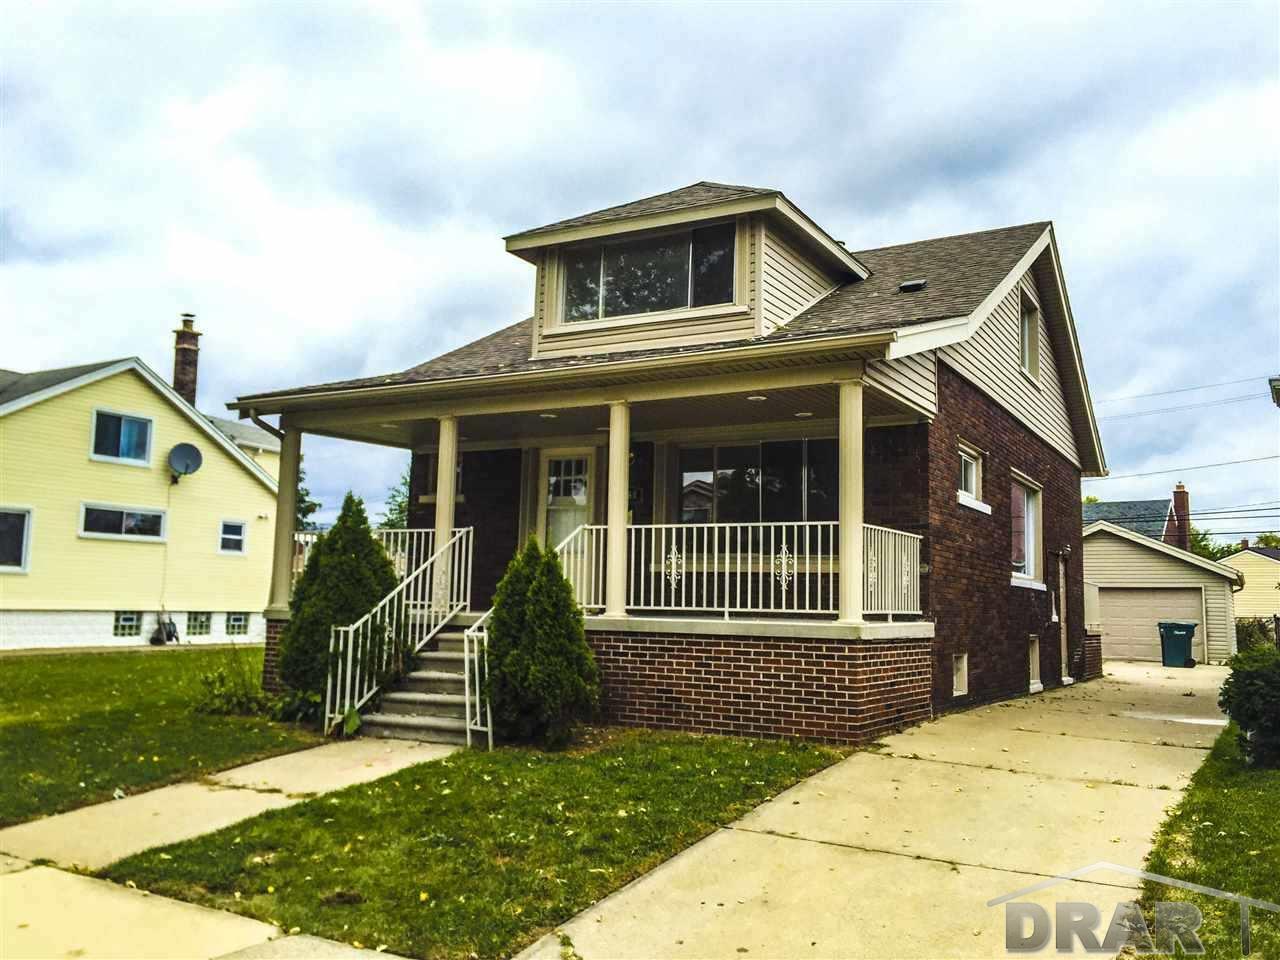 Rental Homes for Rent, ListingId:35889397, location: 4960 ORCHARD UNIT 2 Dearborn 48126